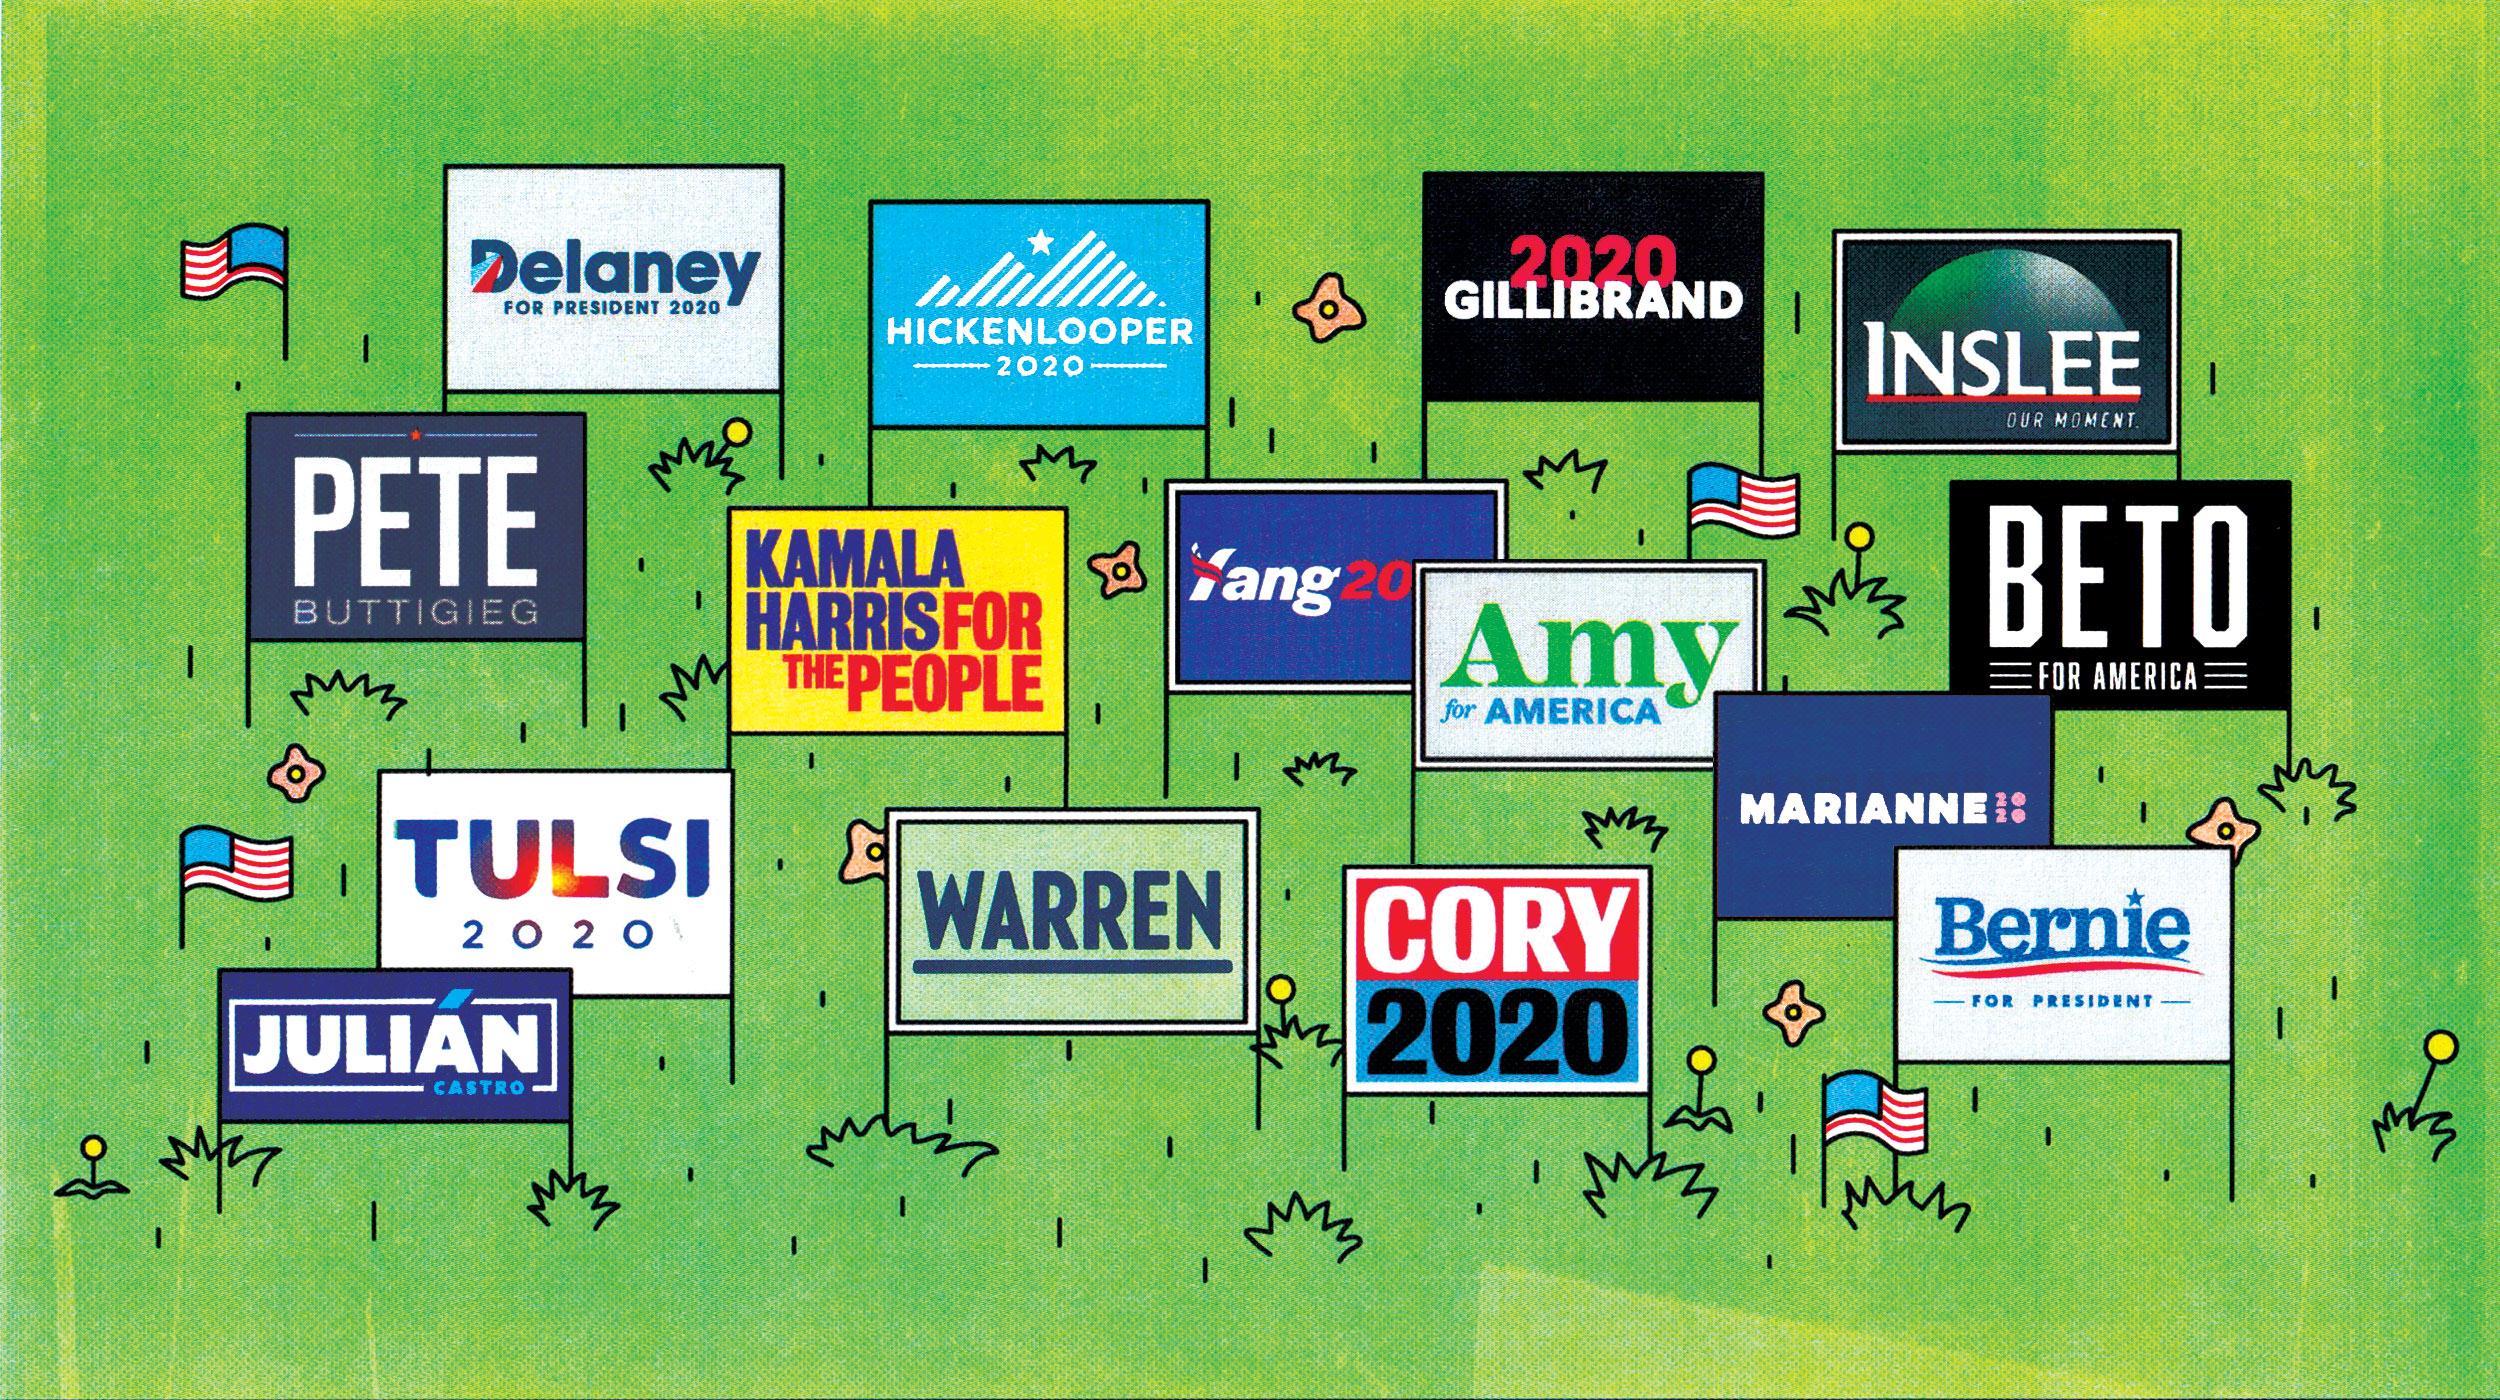 John Delaney for President 2020 BUTTON CLASSIC design Democrat Primary